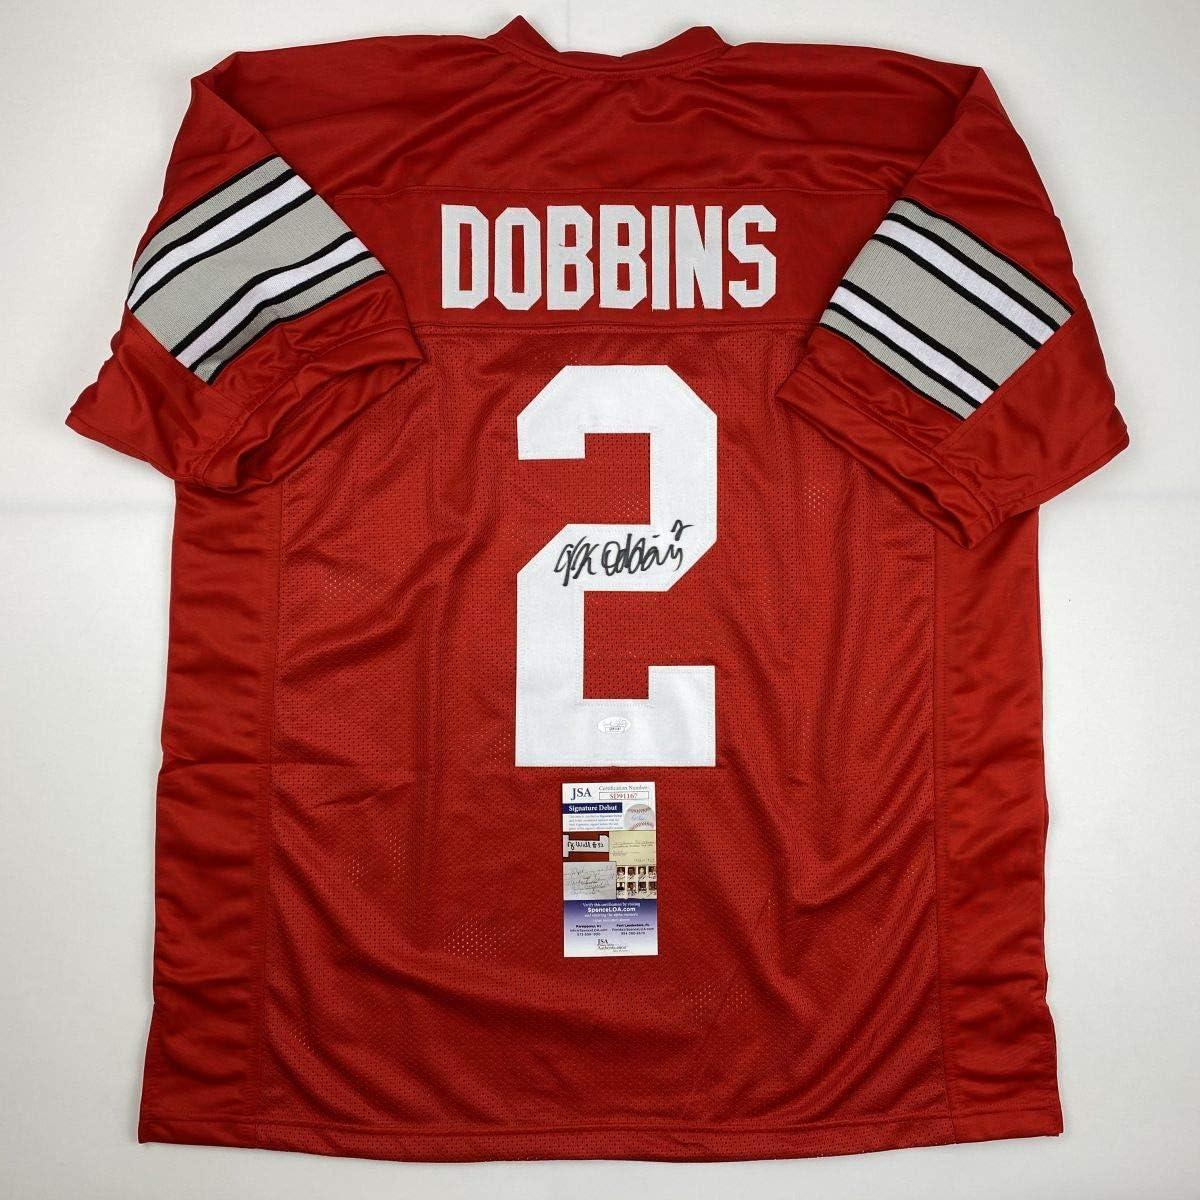 Autographed/Signed JK J.K. Dobbins Ohio State Red College Football Jersey JSA COA 71wS43evhELSL1200_